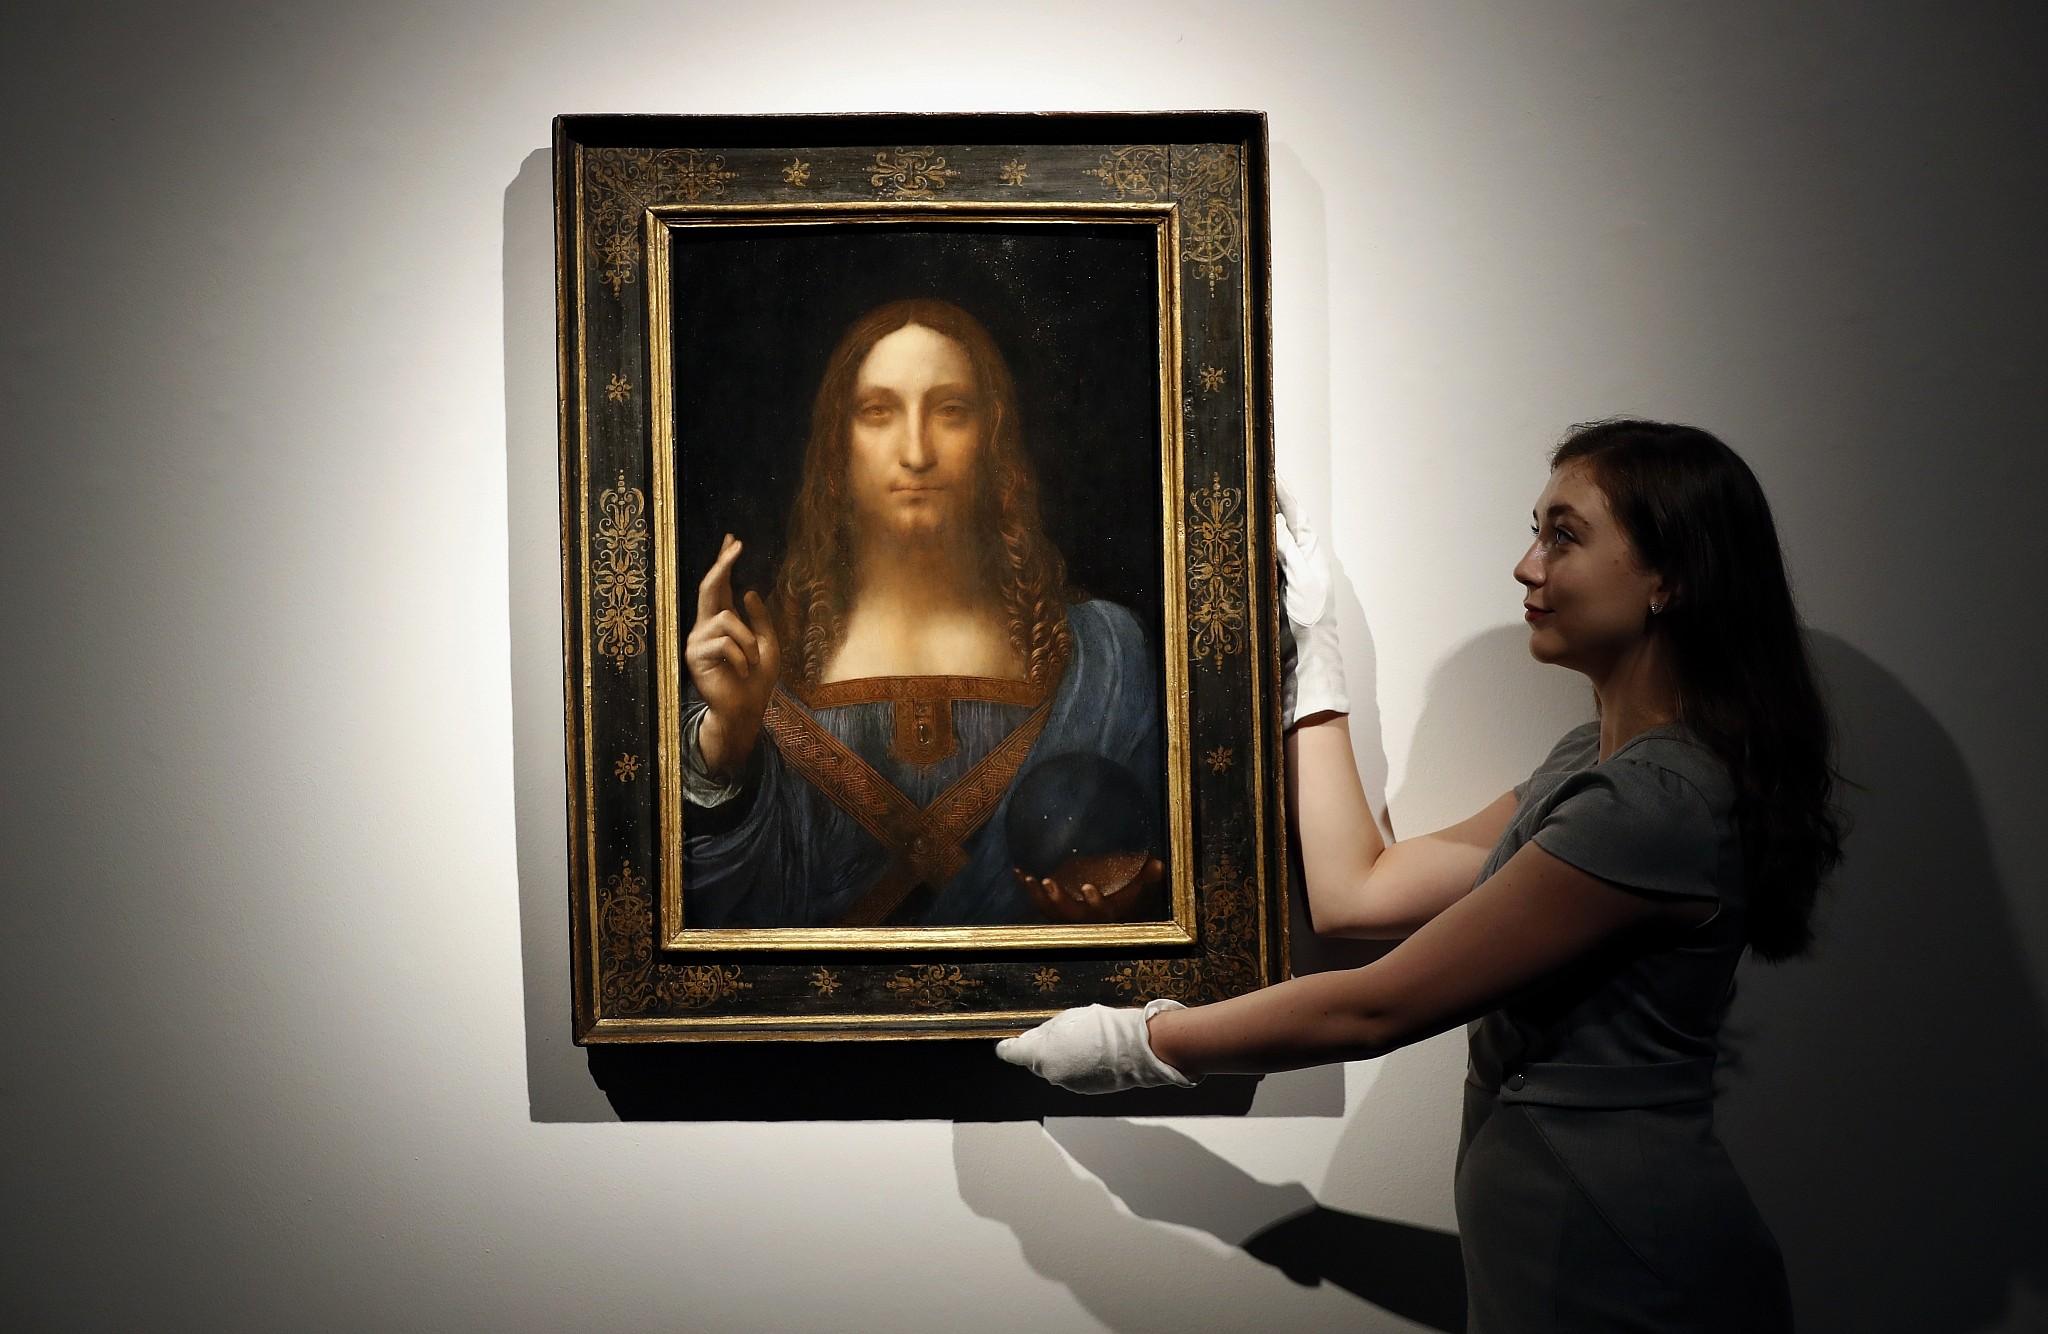 Abu Dhabi delays exhibition of da Vinci's 'Salvator Mundi